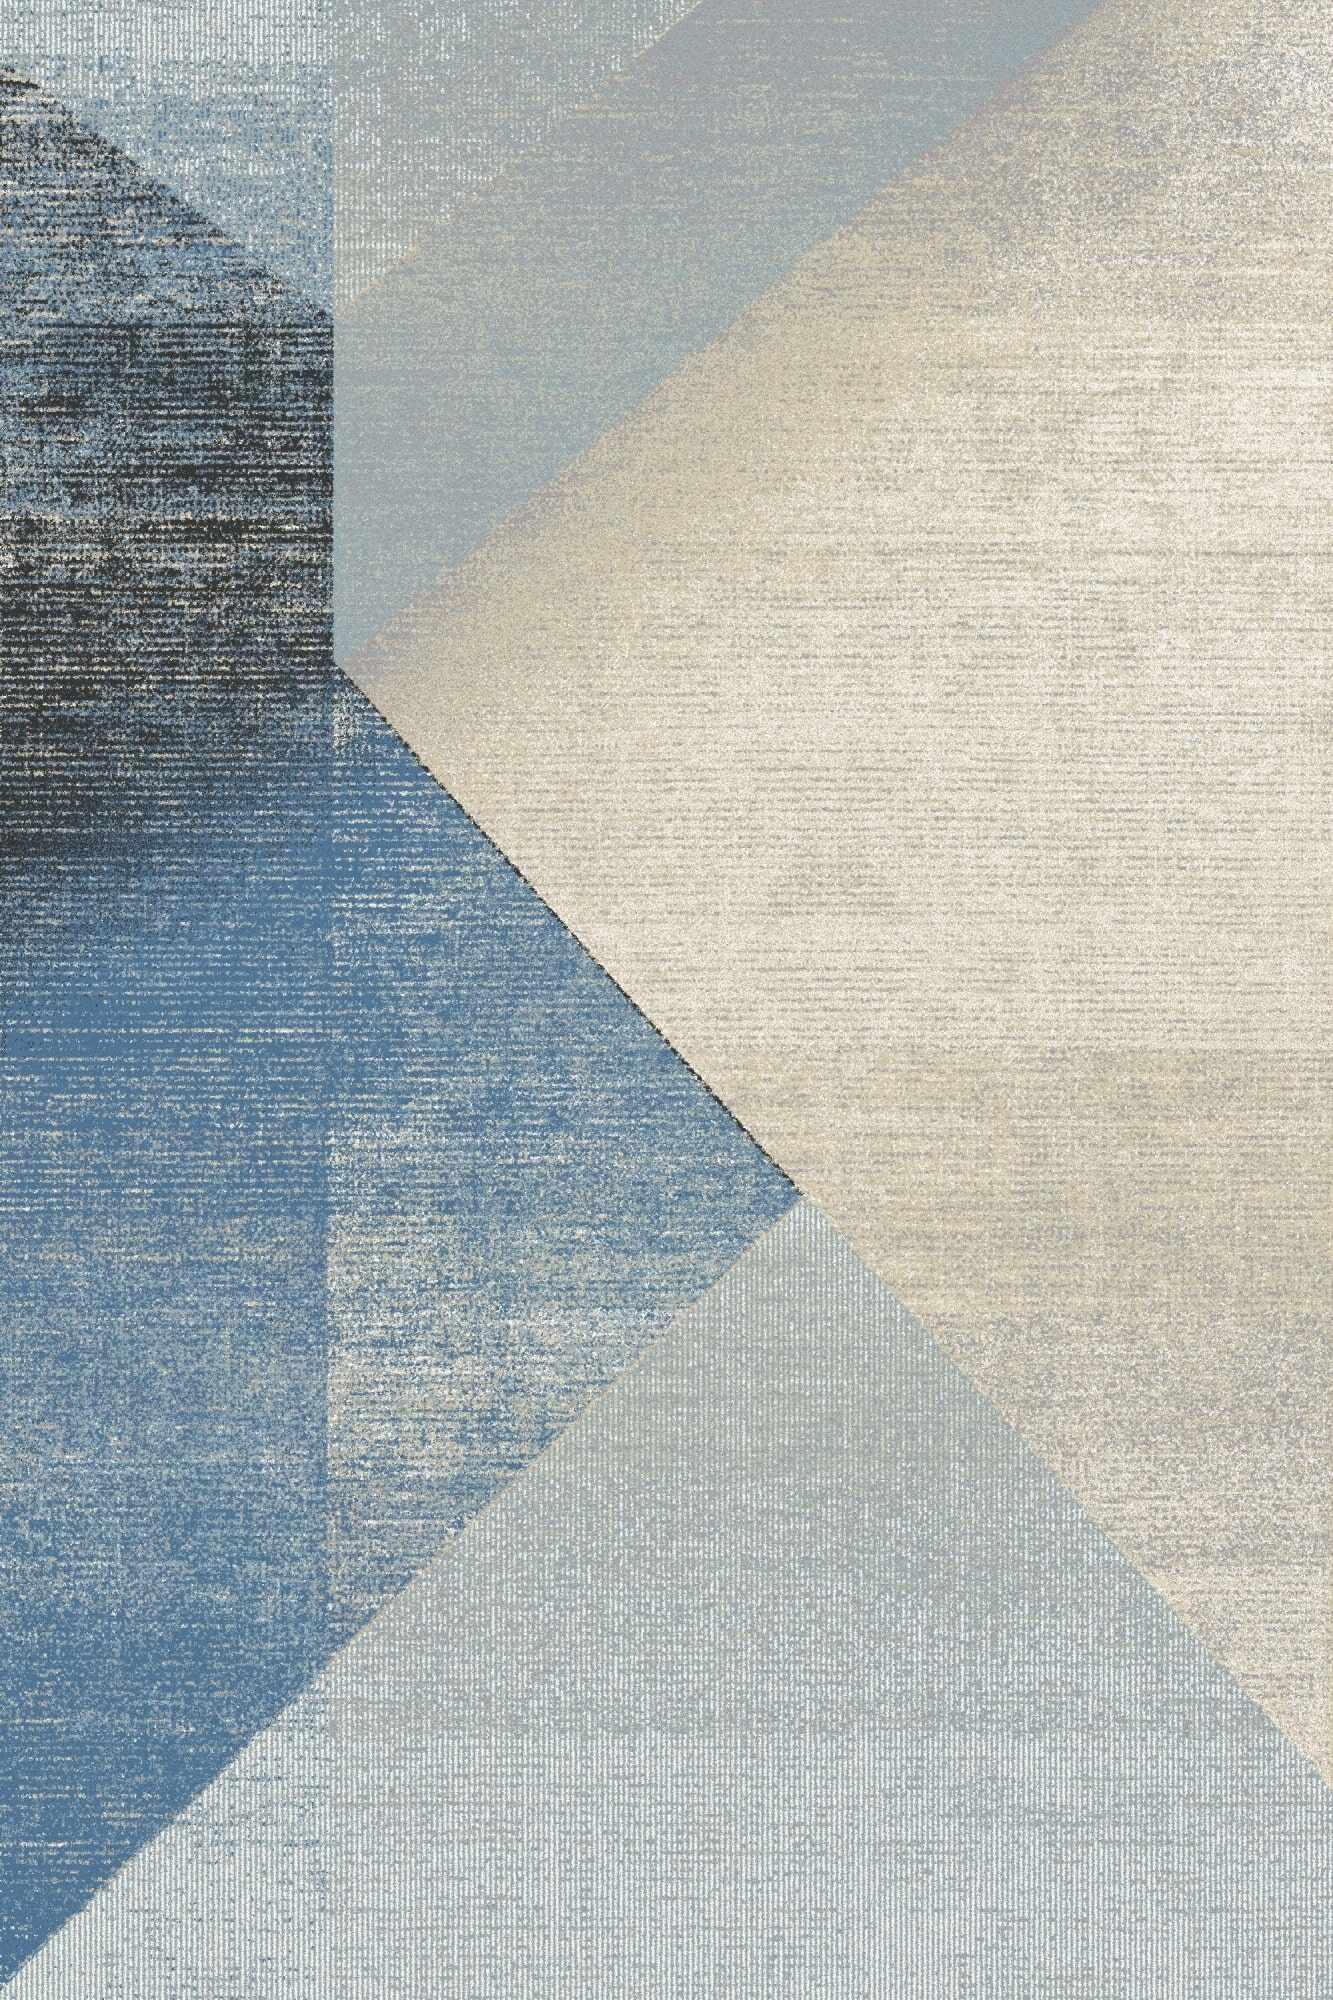 Covor din lana Wido Bleu, Wilton la pret 980 lei